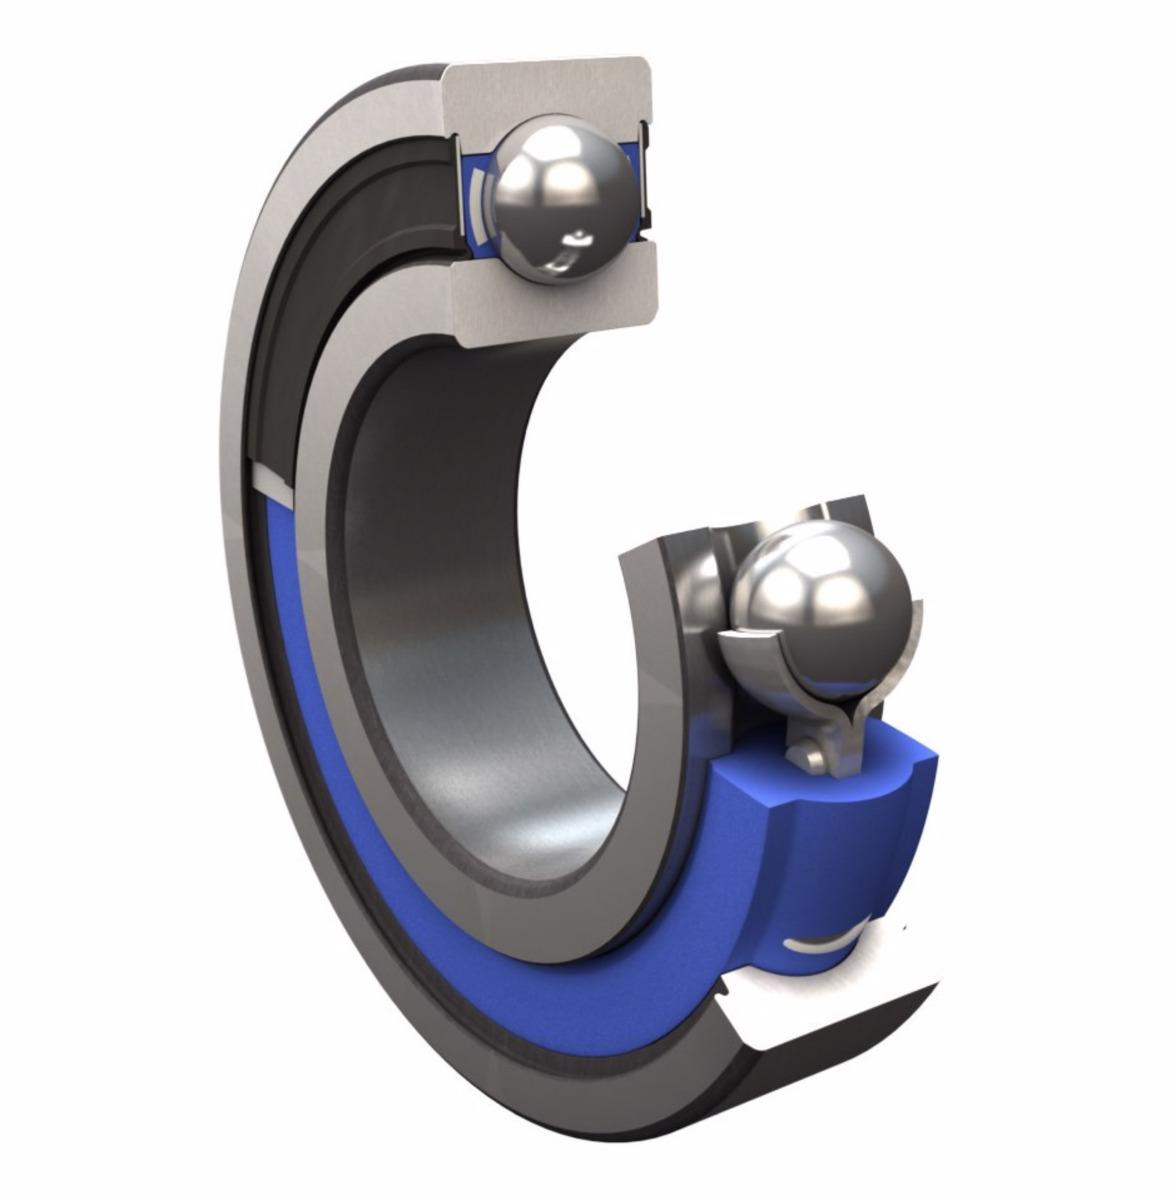 Kugleleje SKF MTRX07 61902-2RS (28x15x7 mm) | lejer